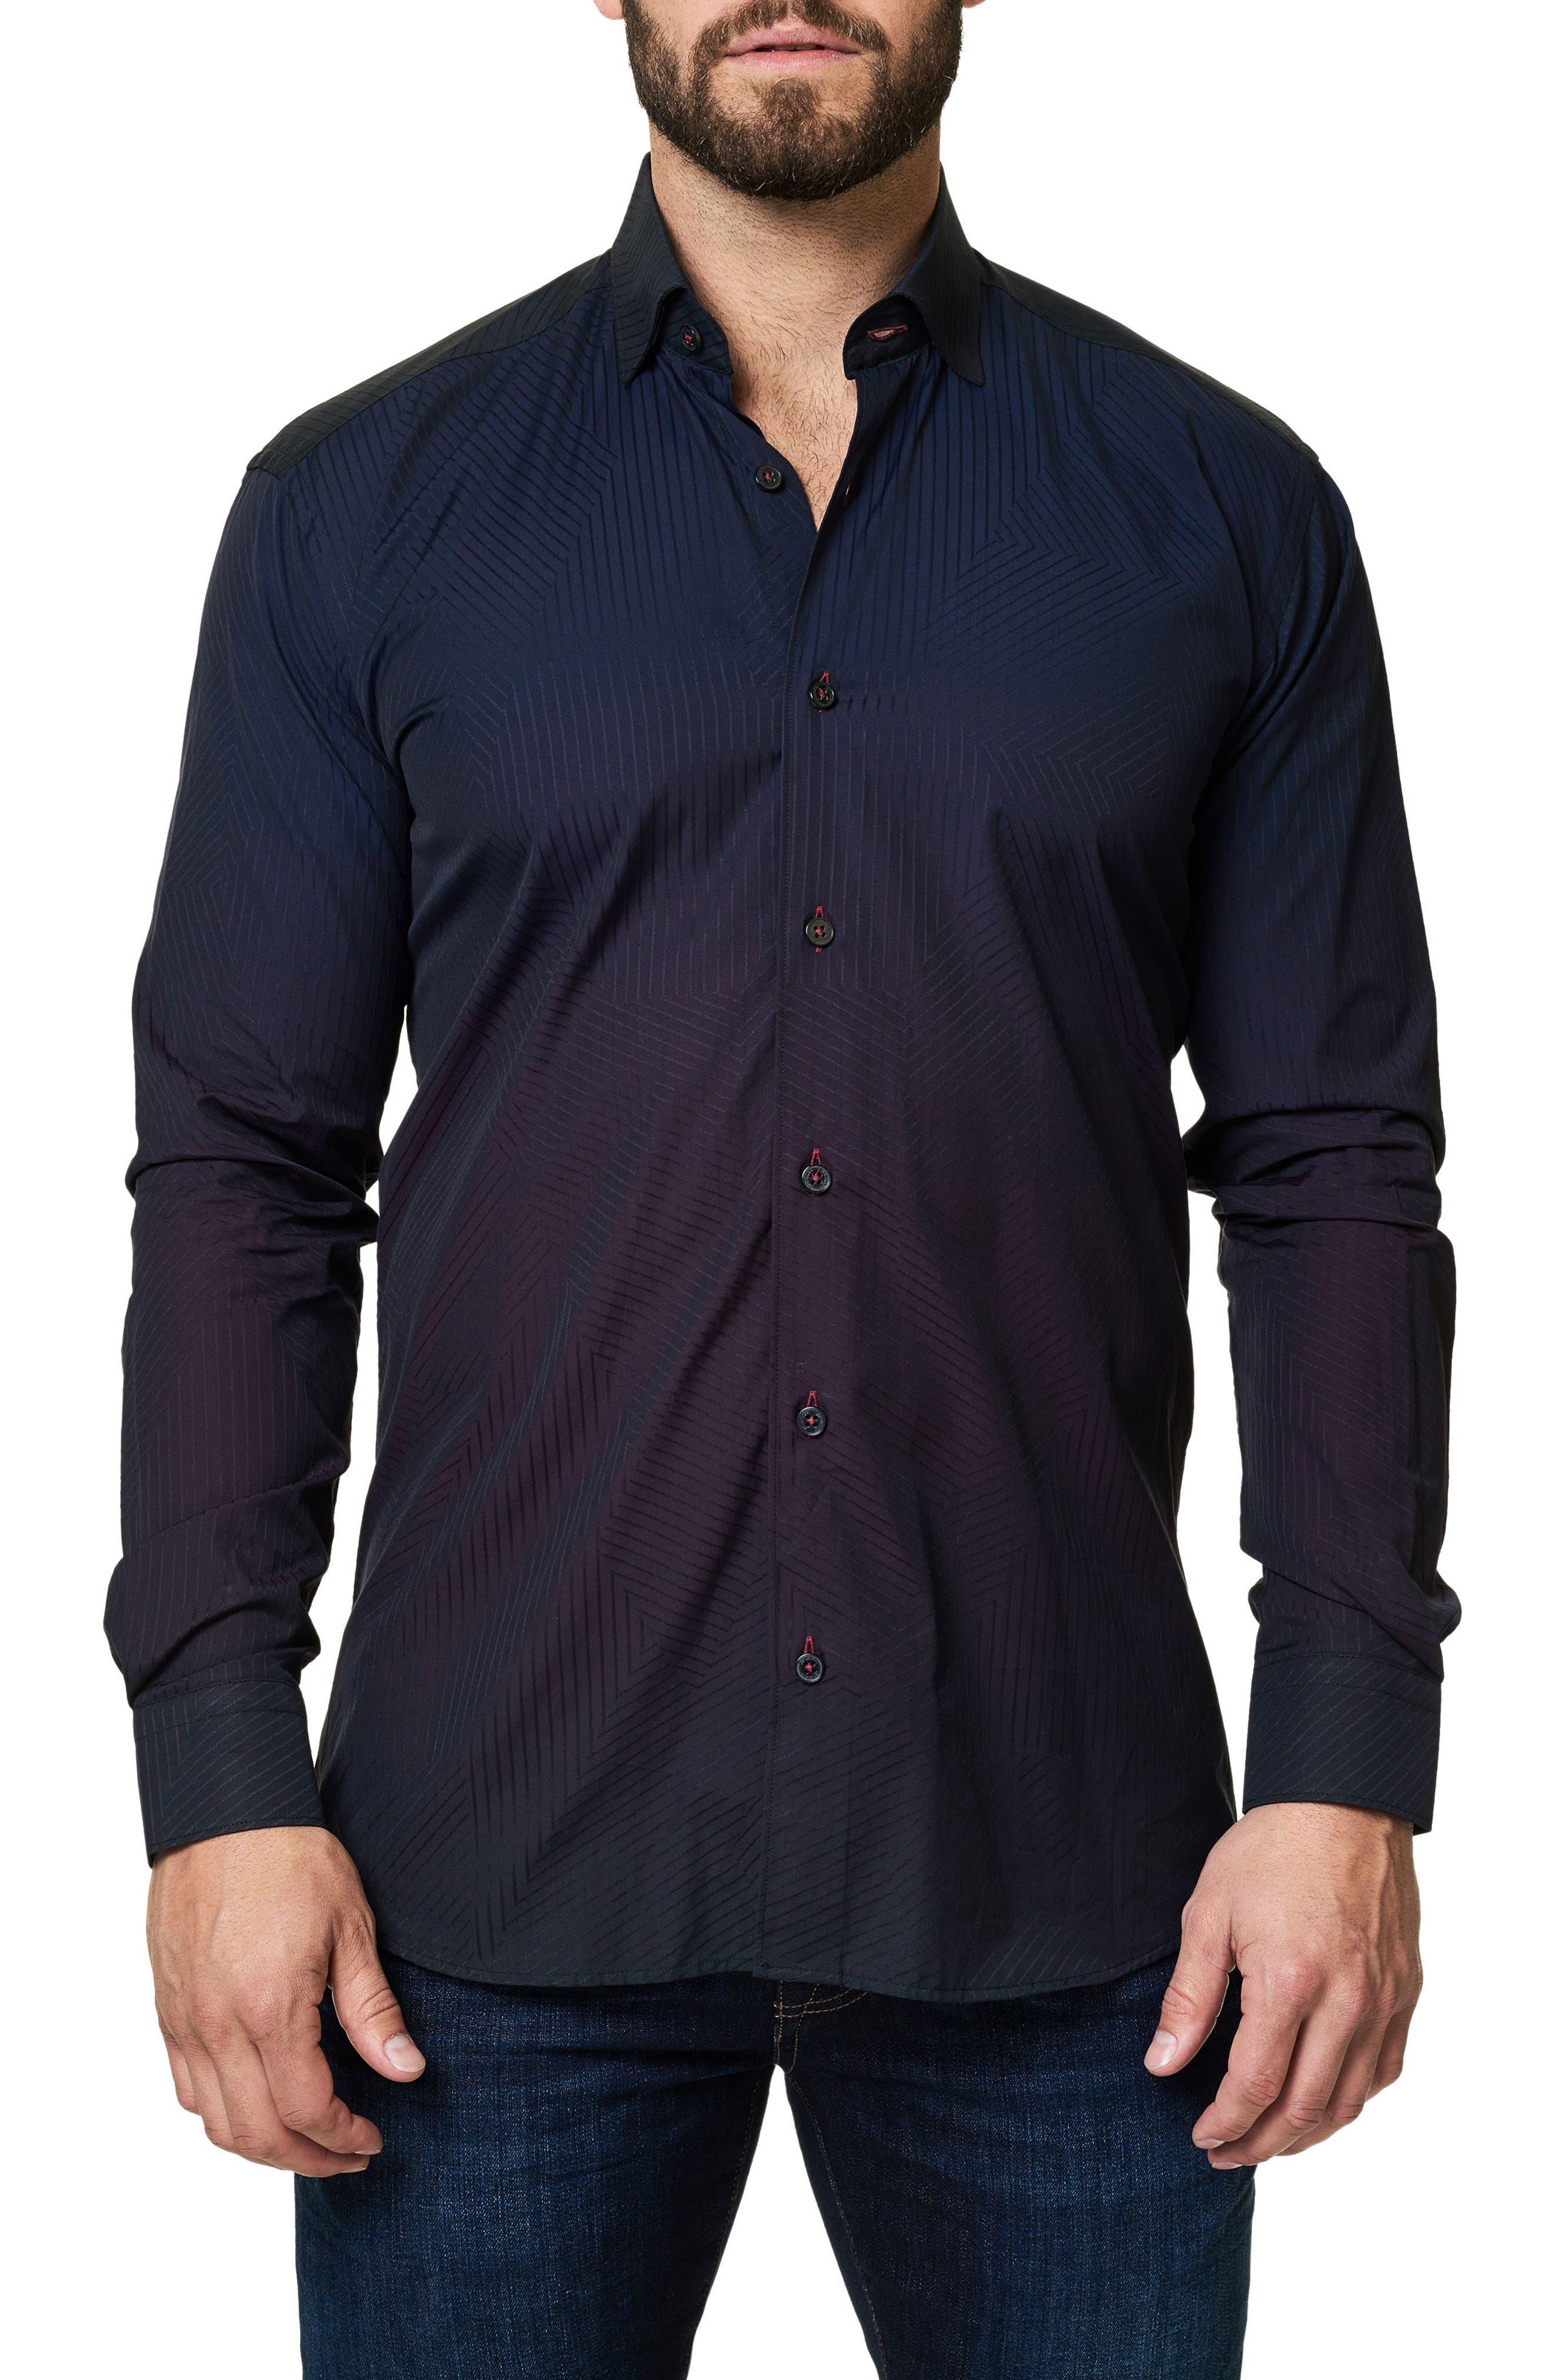 Alternate Image 1 Selected - Maceoo Print Trim Fit Sport Shirt